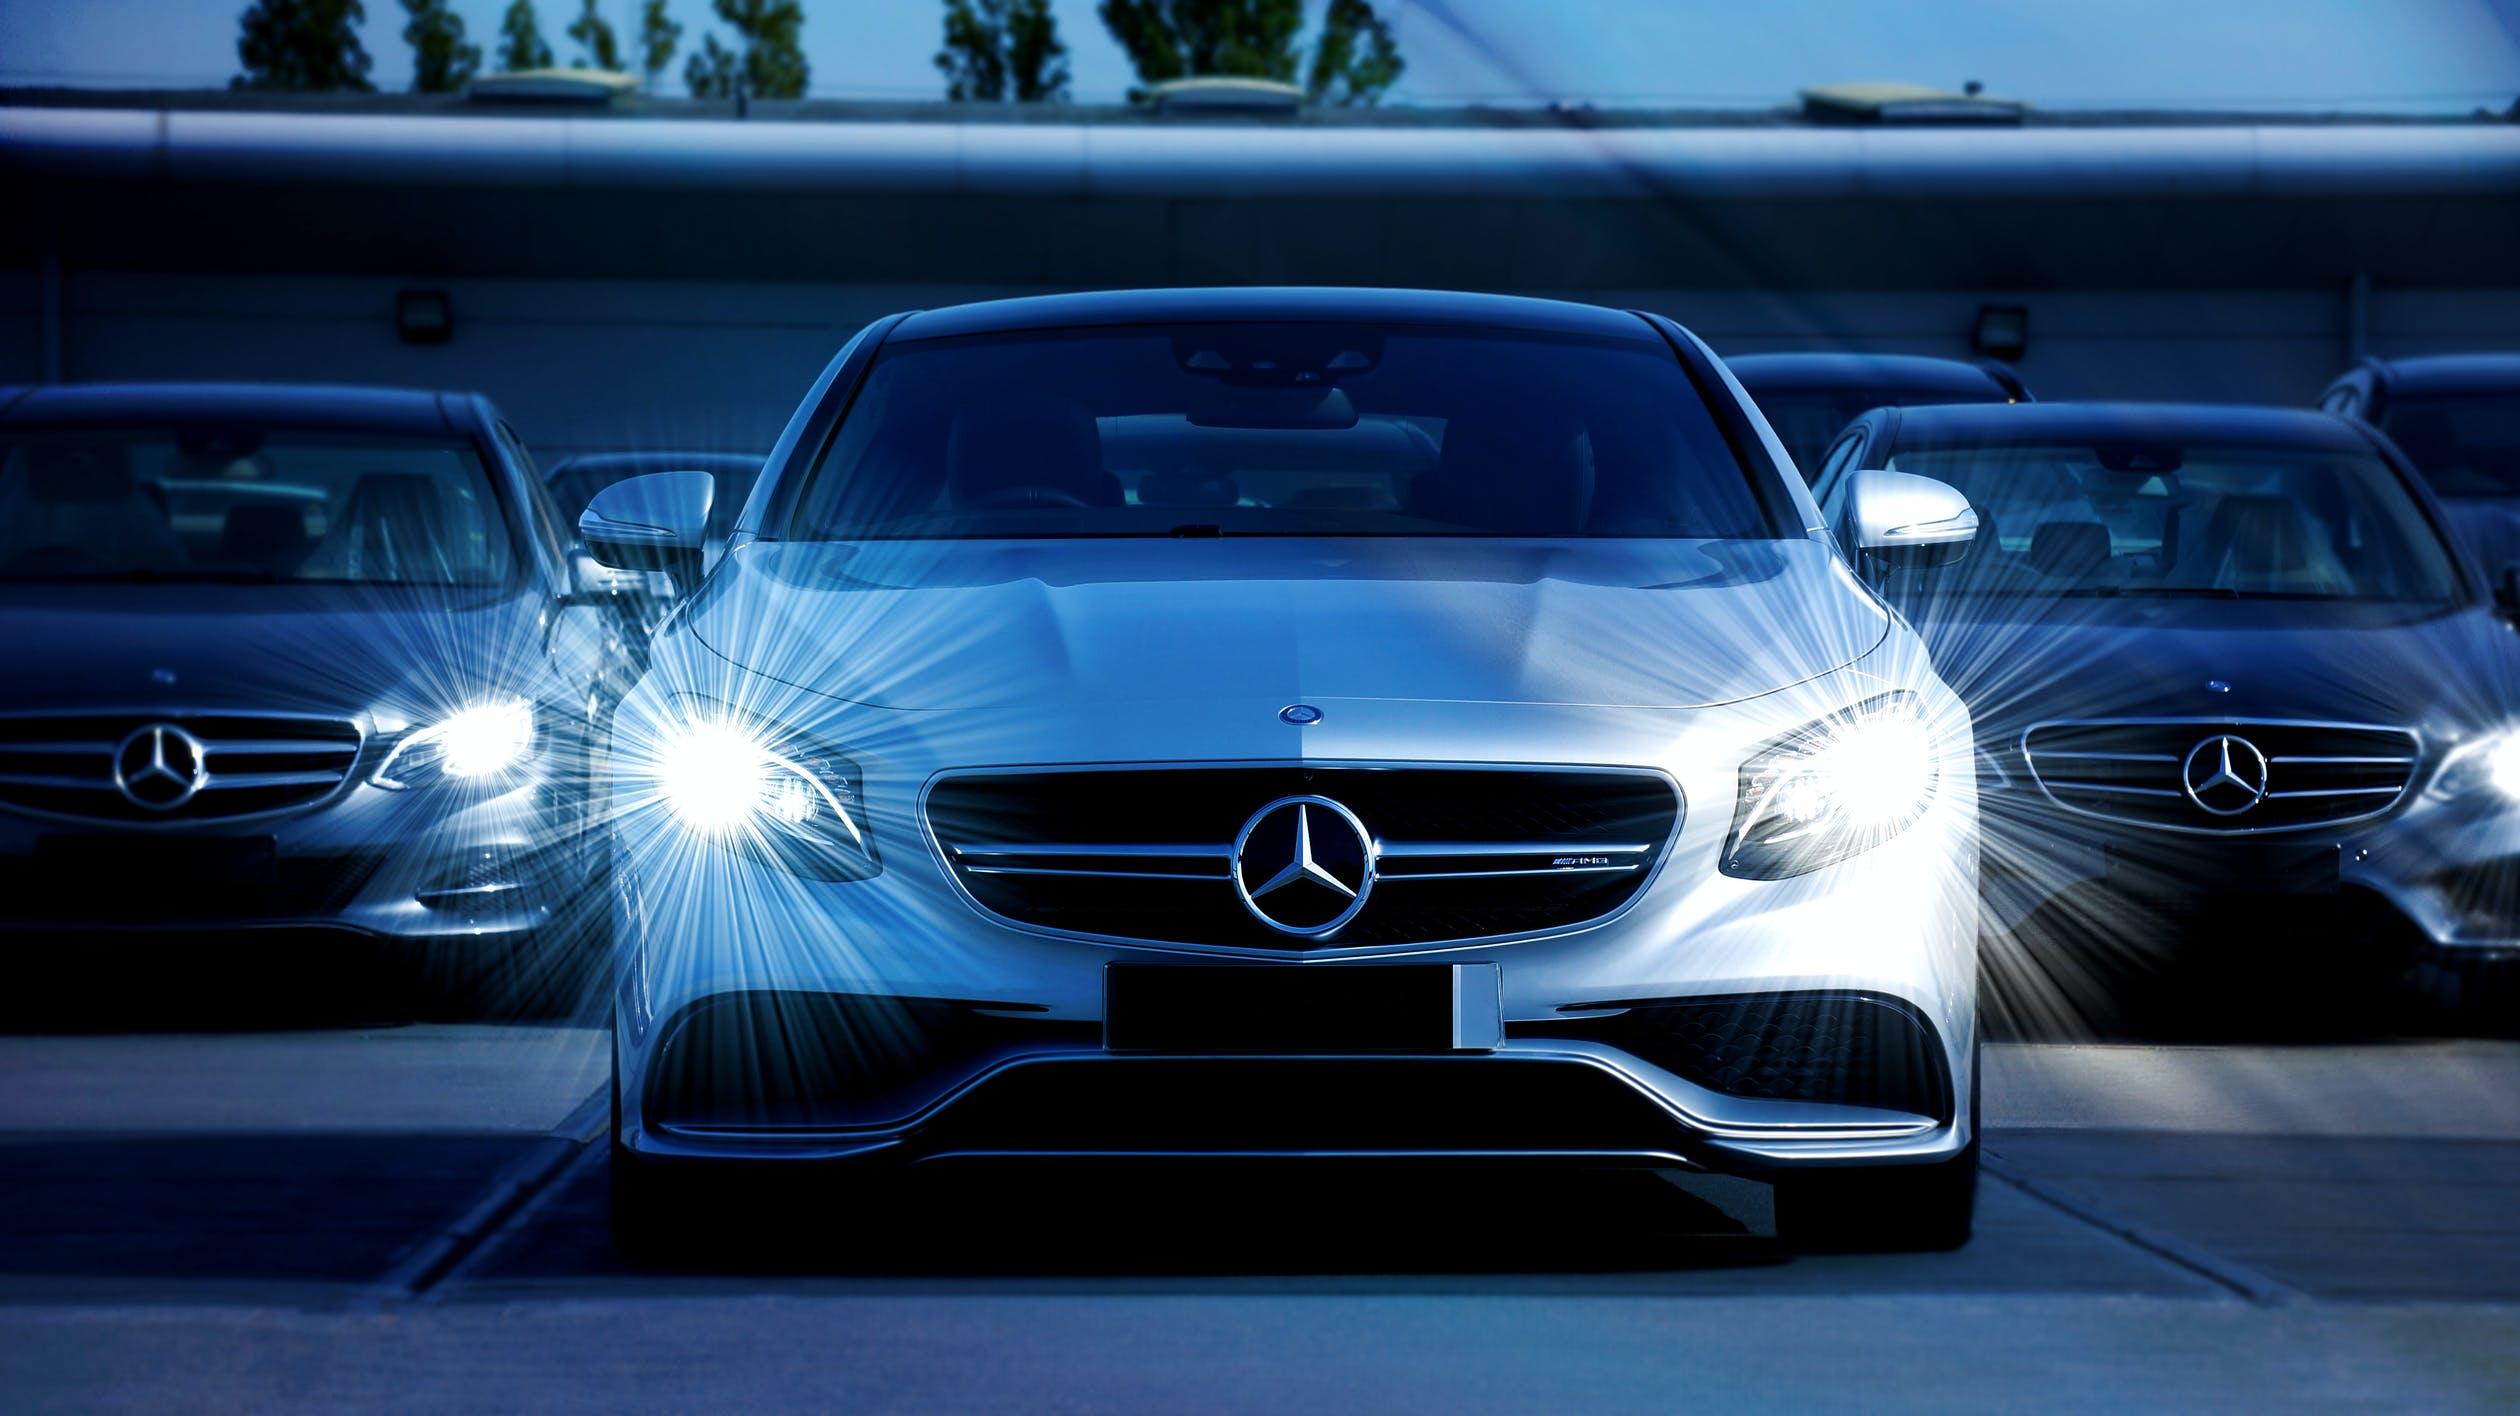 car with headlights on